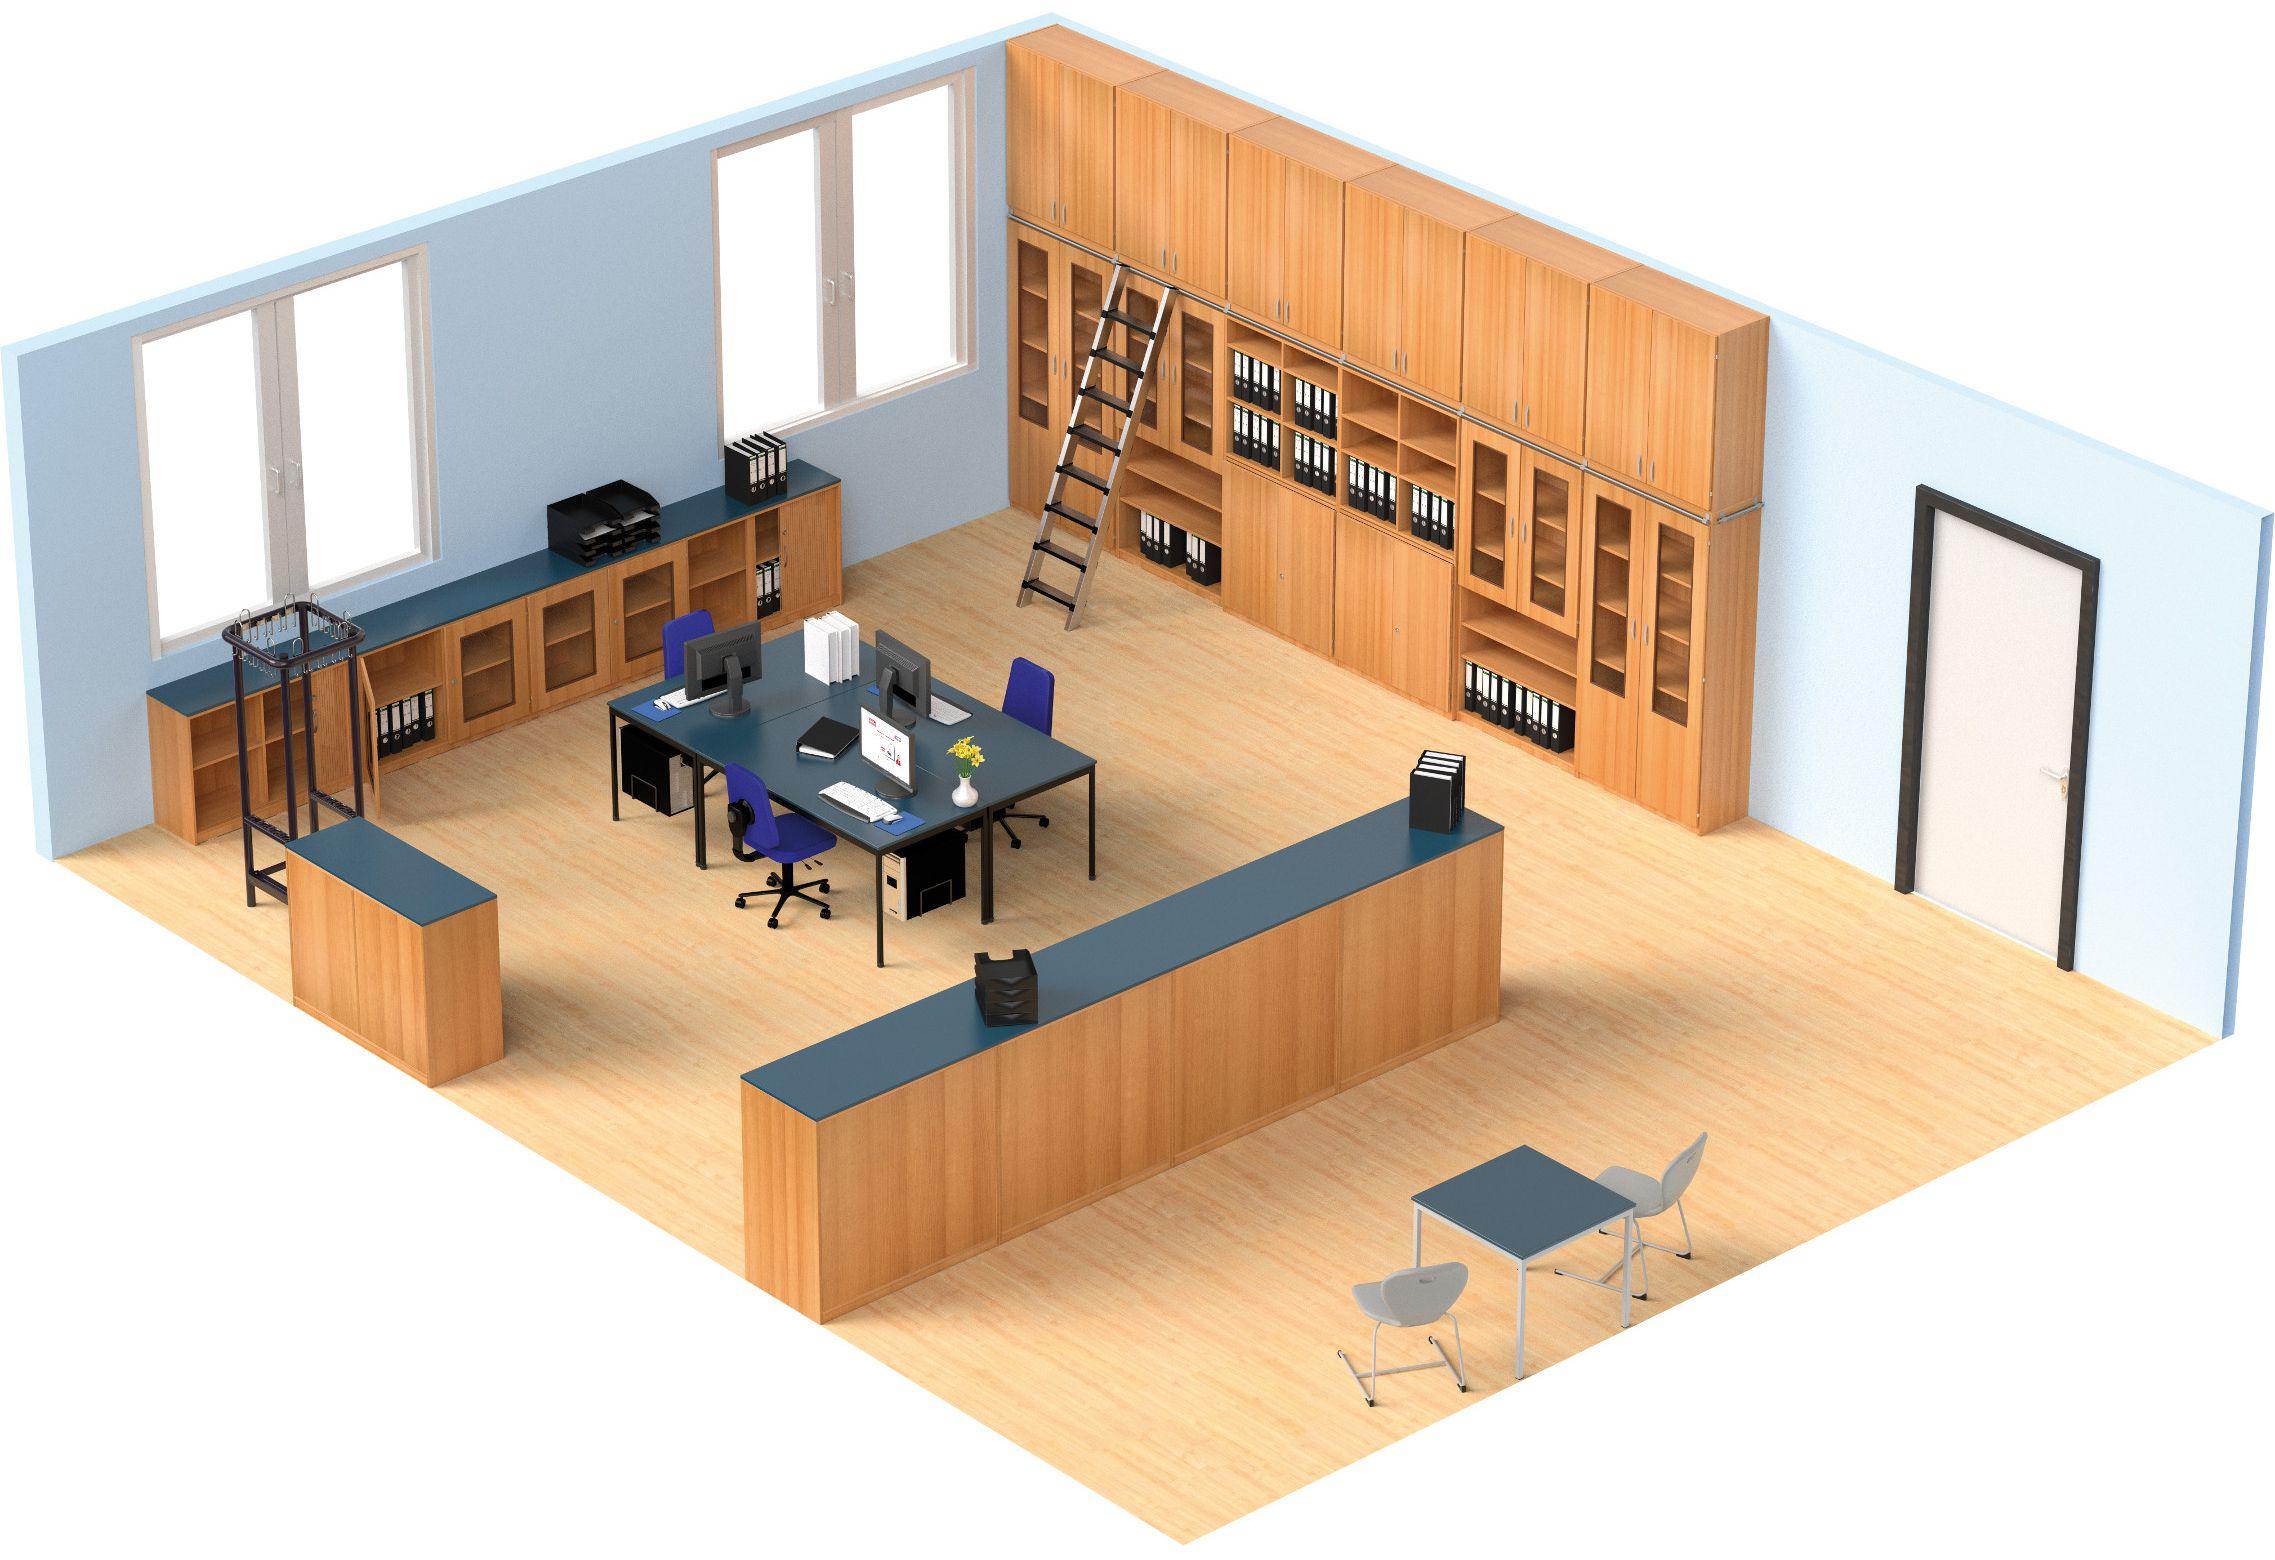 Raumplanung eines Sekretariats